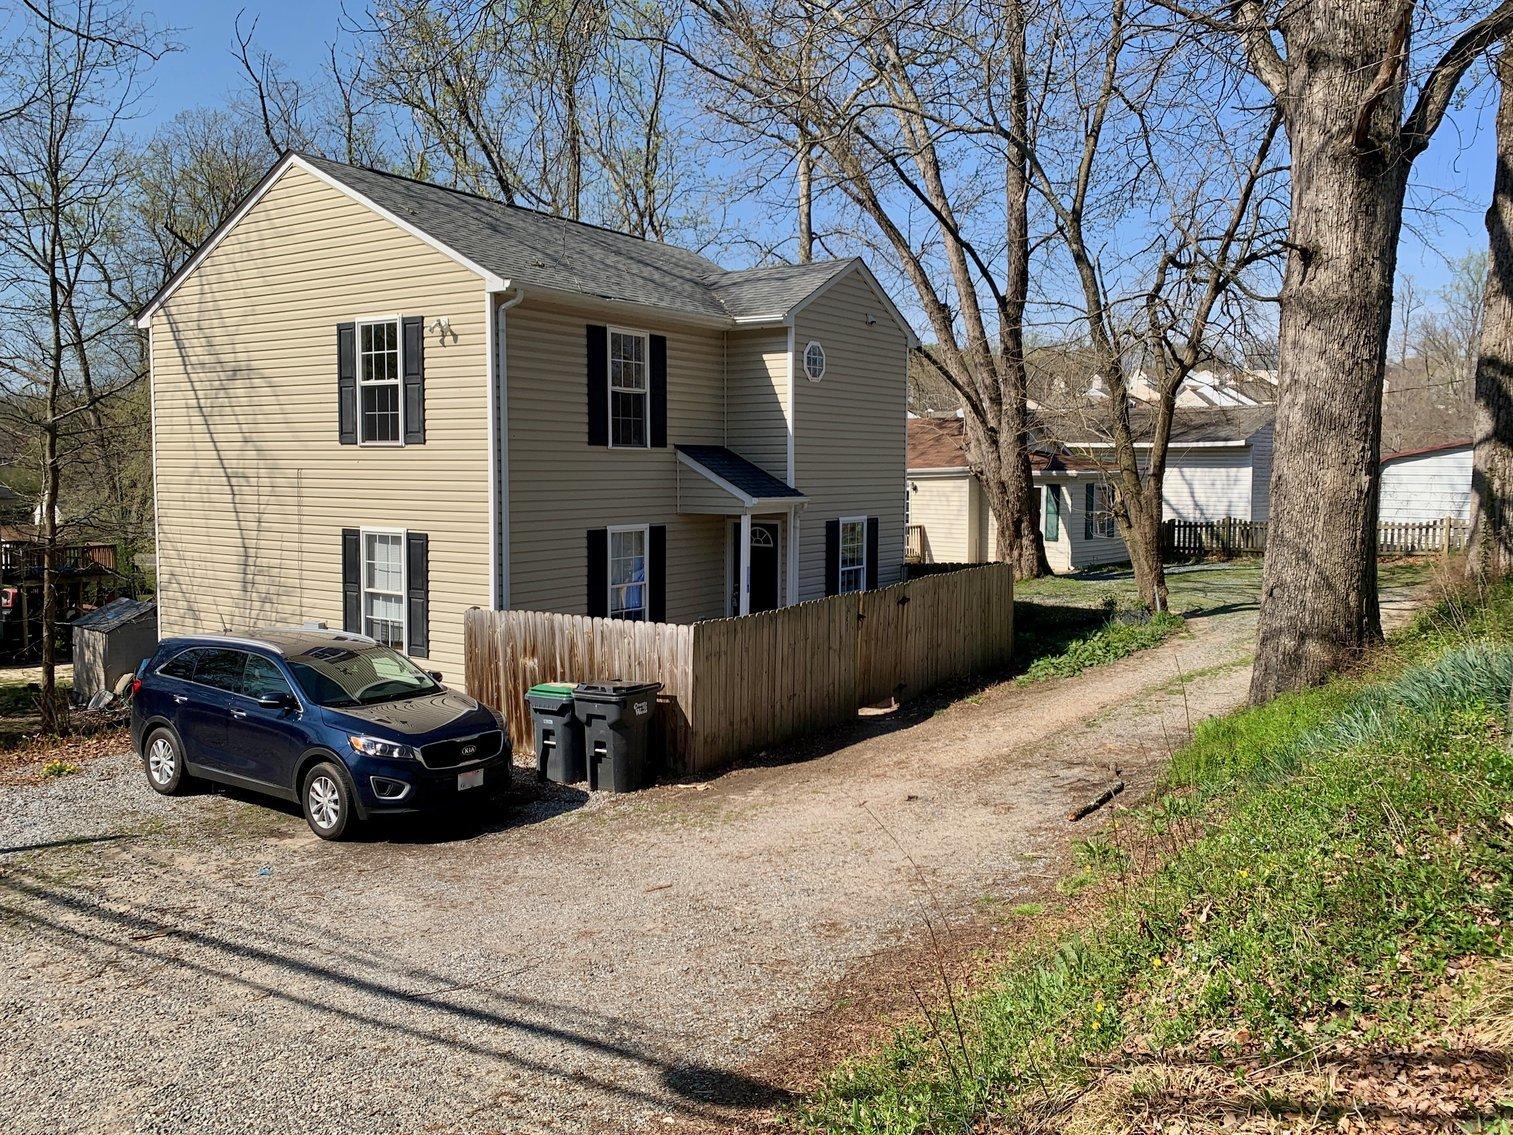 Image for 241, 243, and 245 Cambridge Street, Fredericksburg, VA